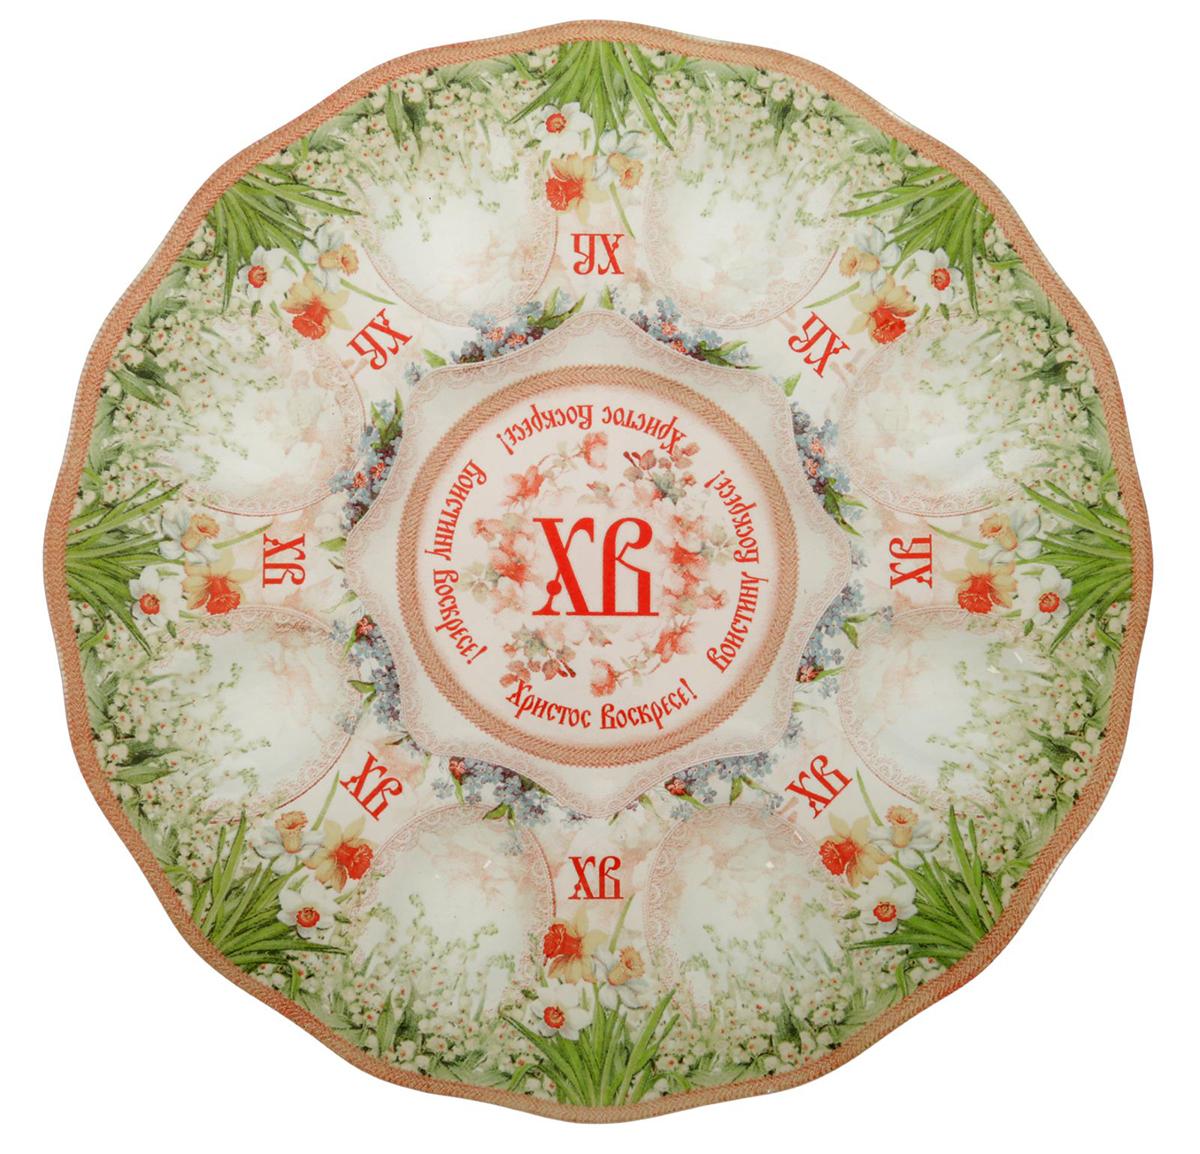 "Подставка для яйца ""Цветочная"", на 8 яиц, диаметр 25 см. 1766210"